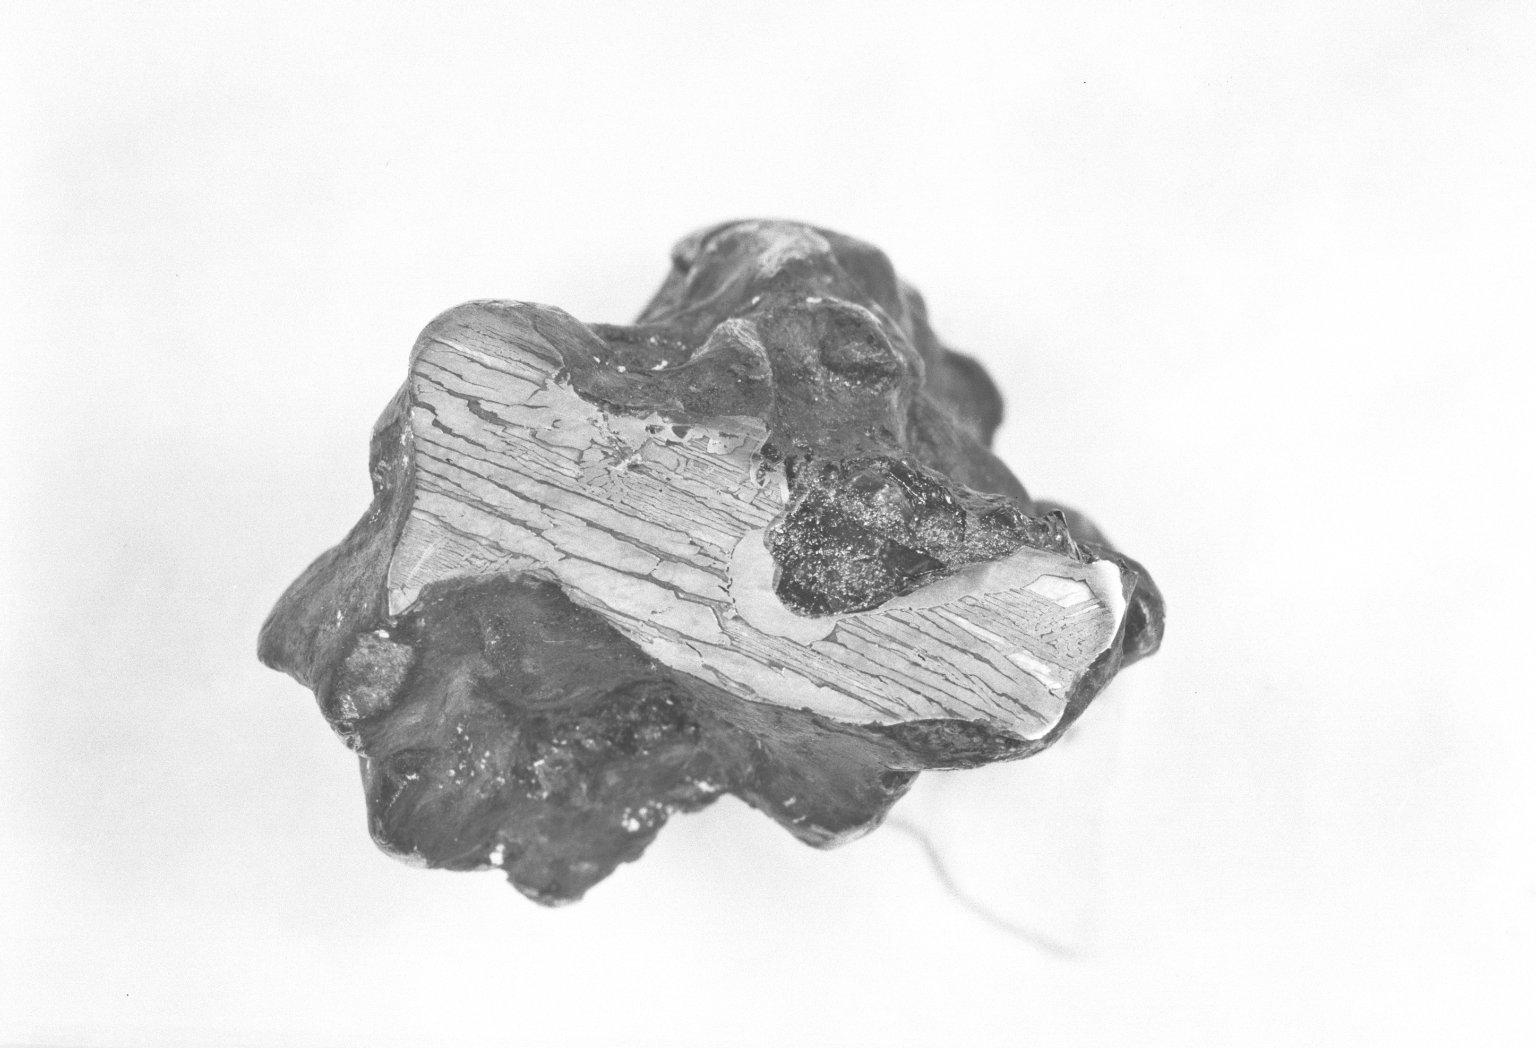 Specimen from Glorieta Mtn., NM